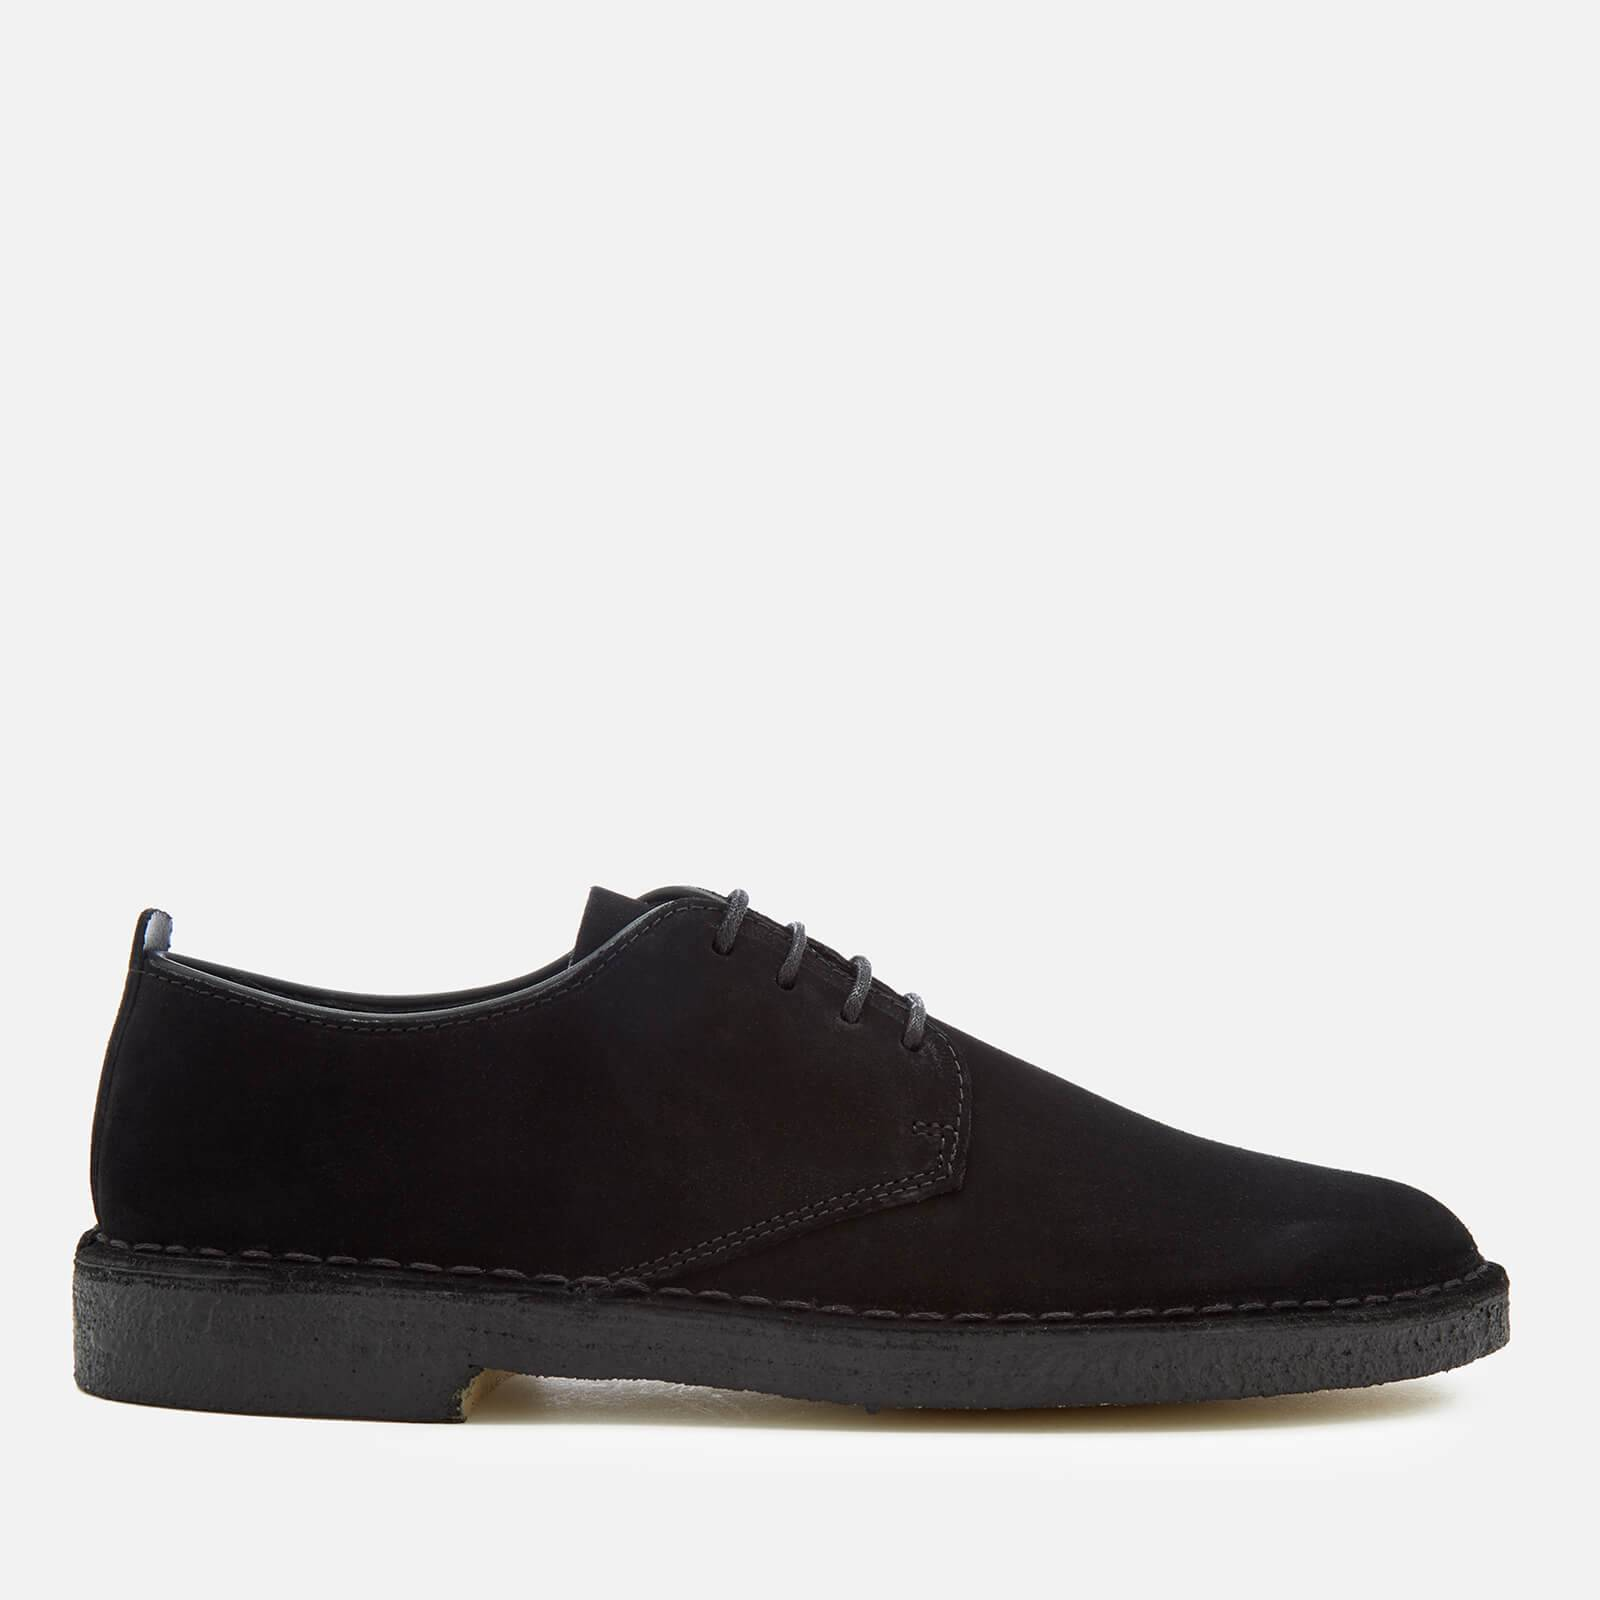 Clarks Originals Men's Desert London Shoes - Black - UK 7 - Black